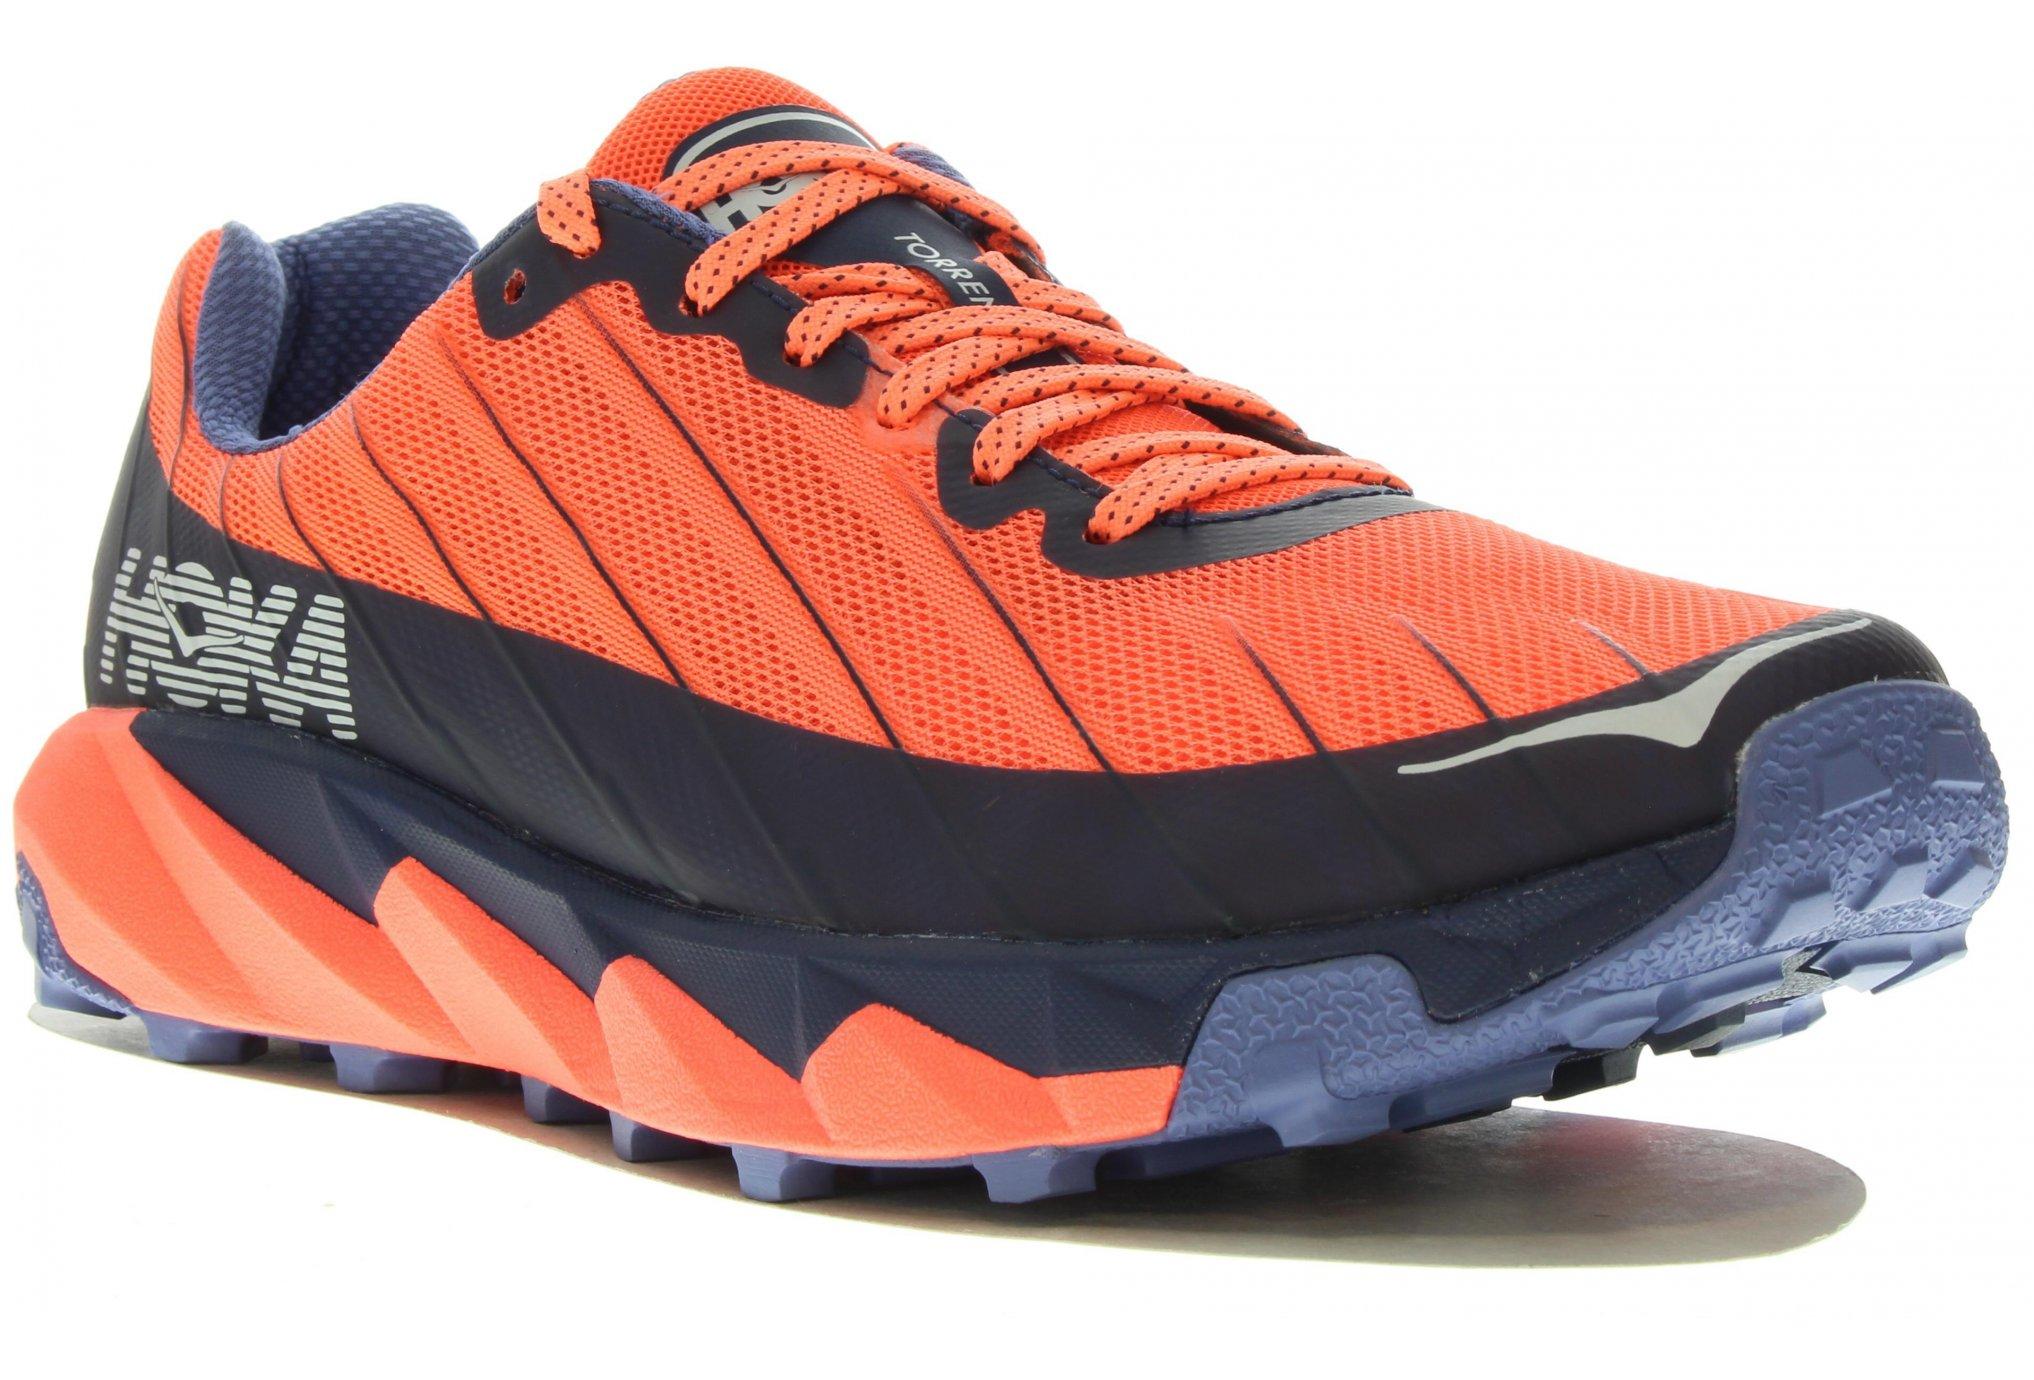 Hoka One One Torrent Chaussures running femme